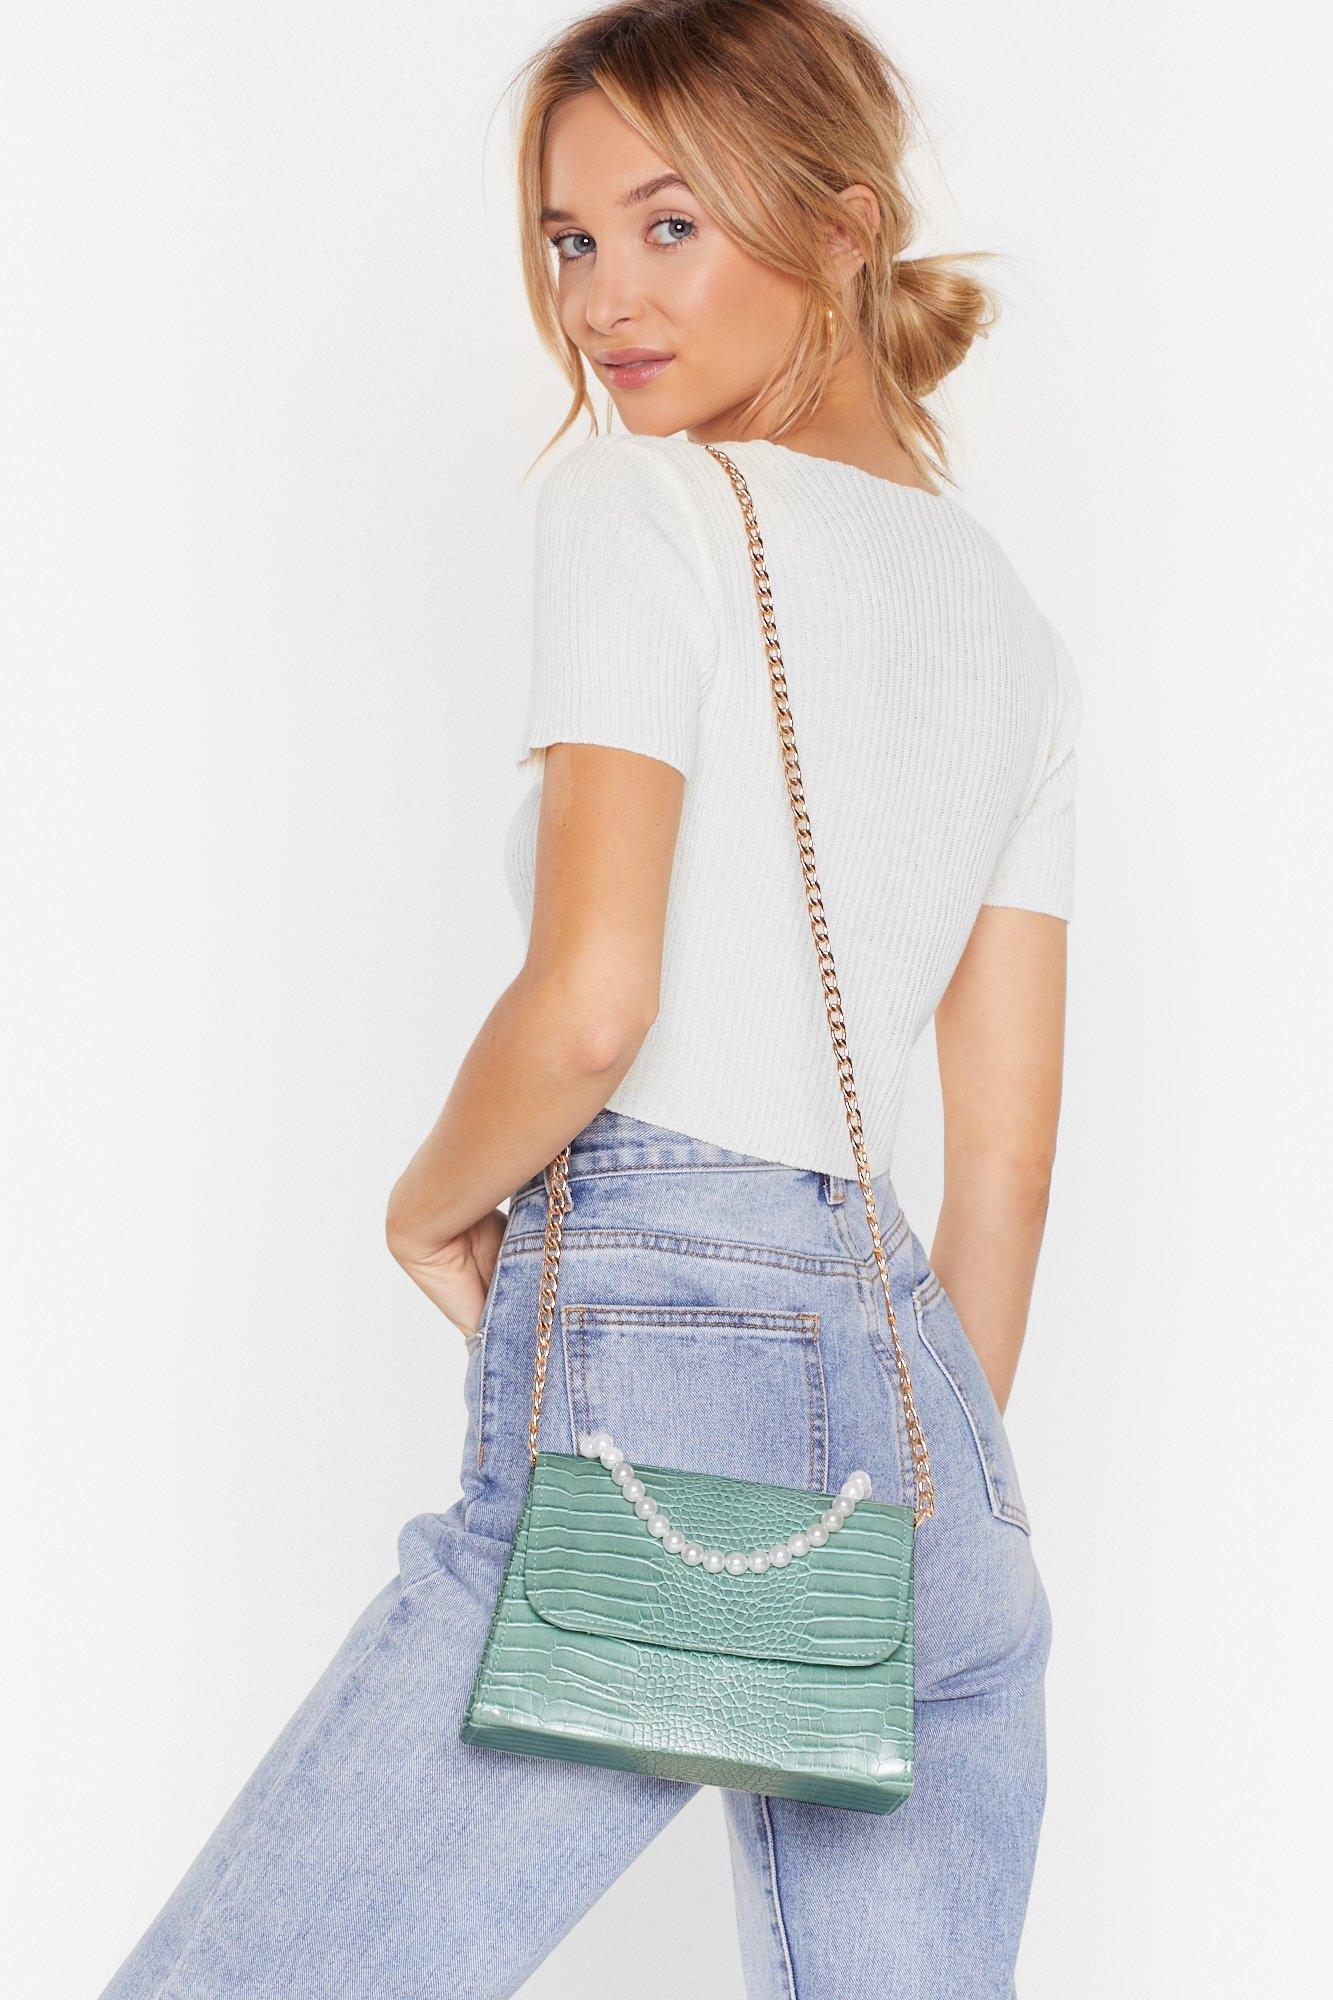 Image of WANT Grab the Pearls Croc Crossbody Bag